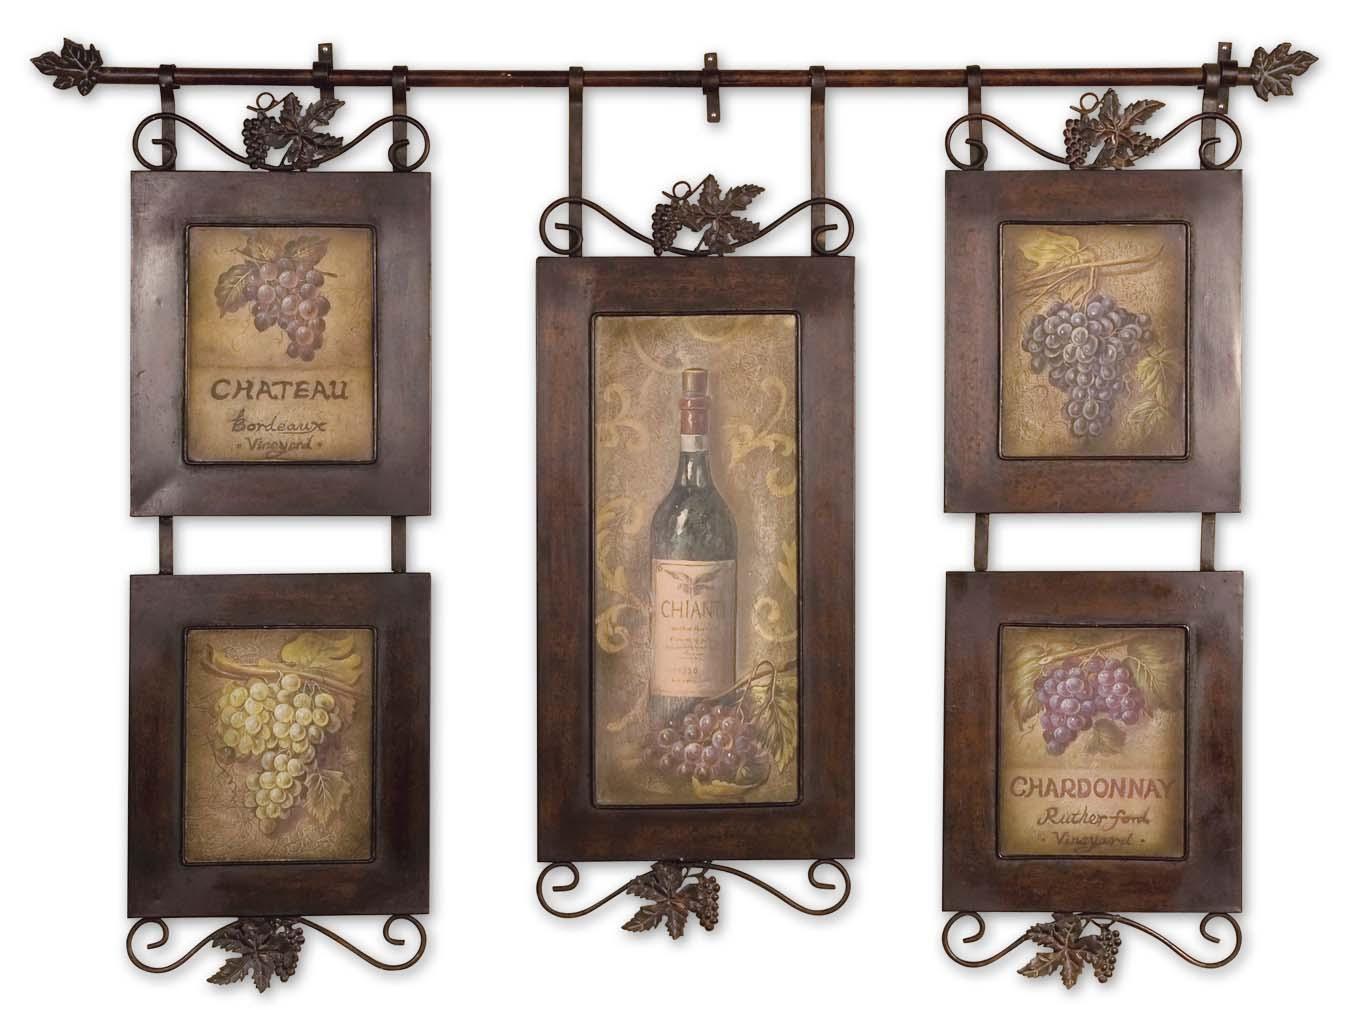 Room Decor : Tuscan Bedroom Wall Decor Ideas Of Tuscan Wall Decor For Italian Wall Art For Bedroom (Image 10 of 20)